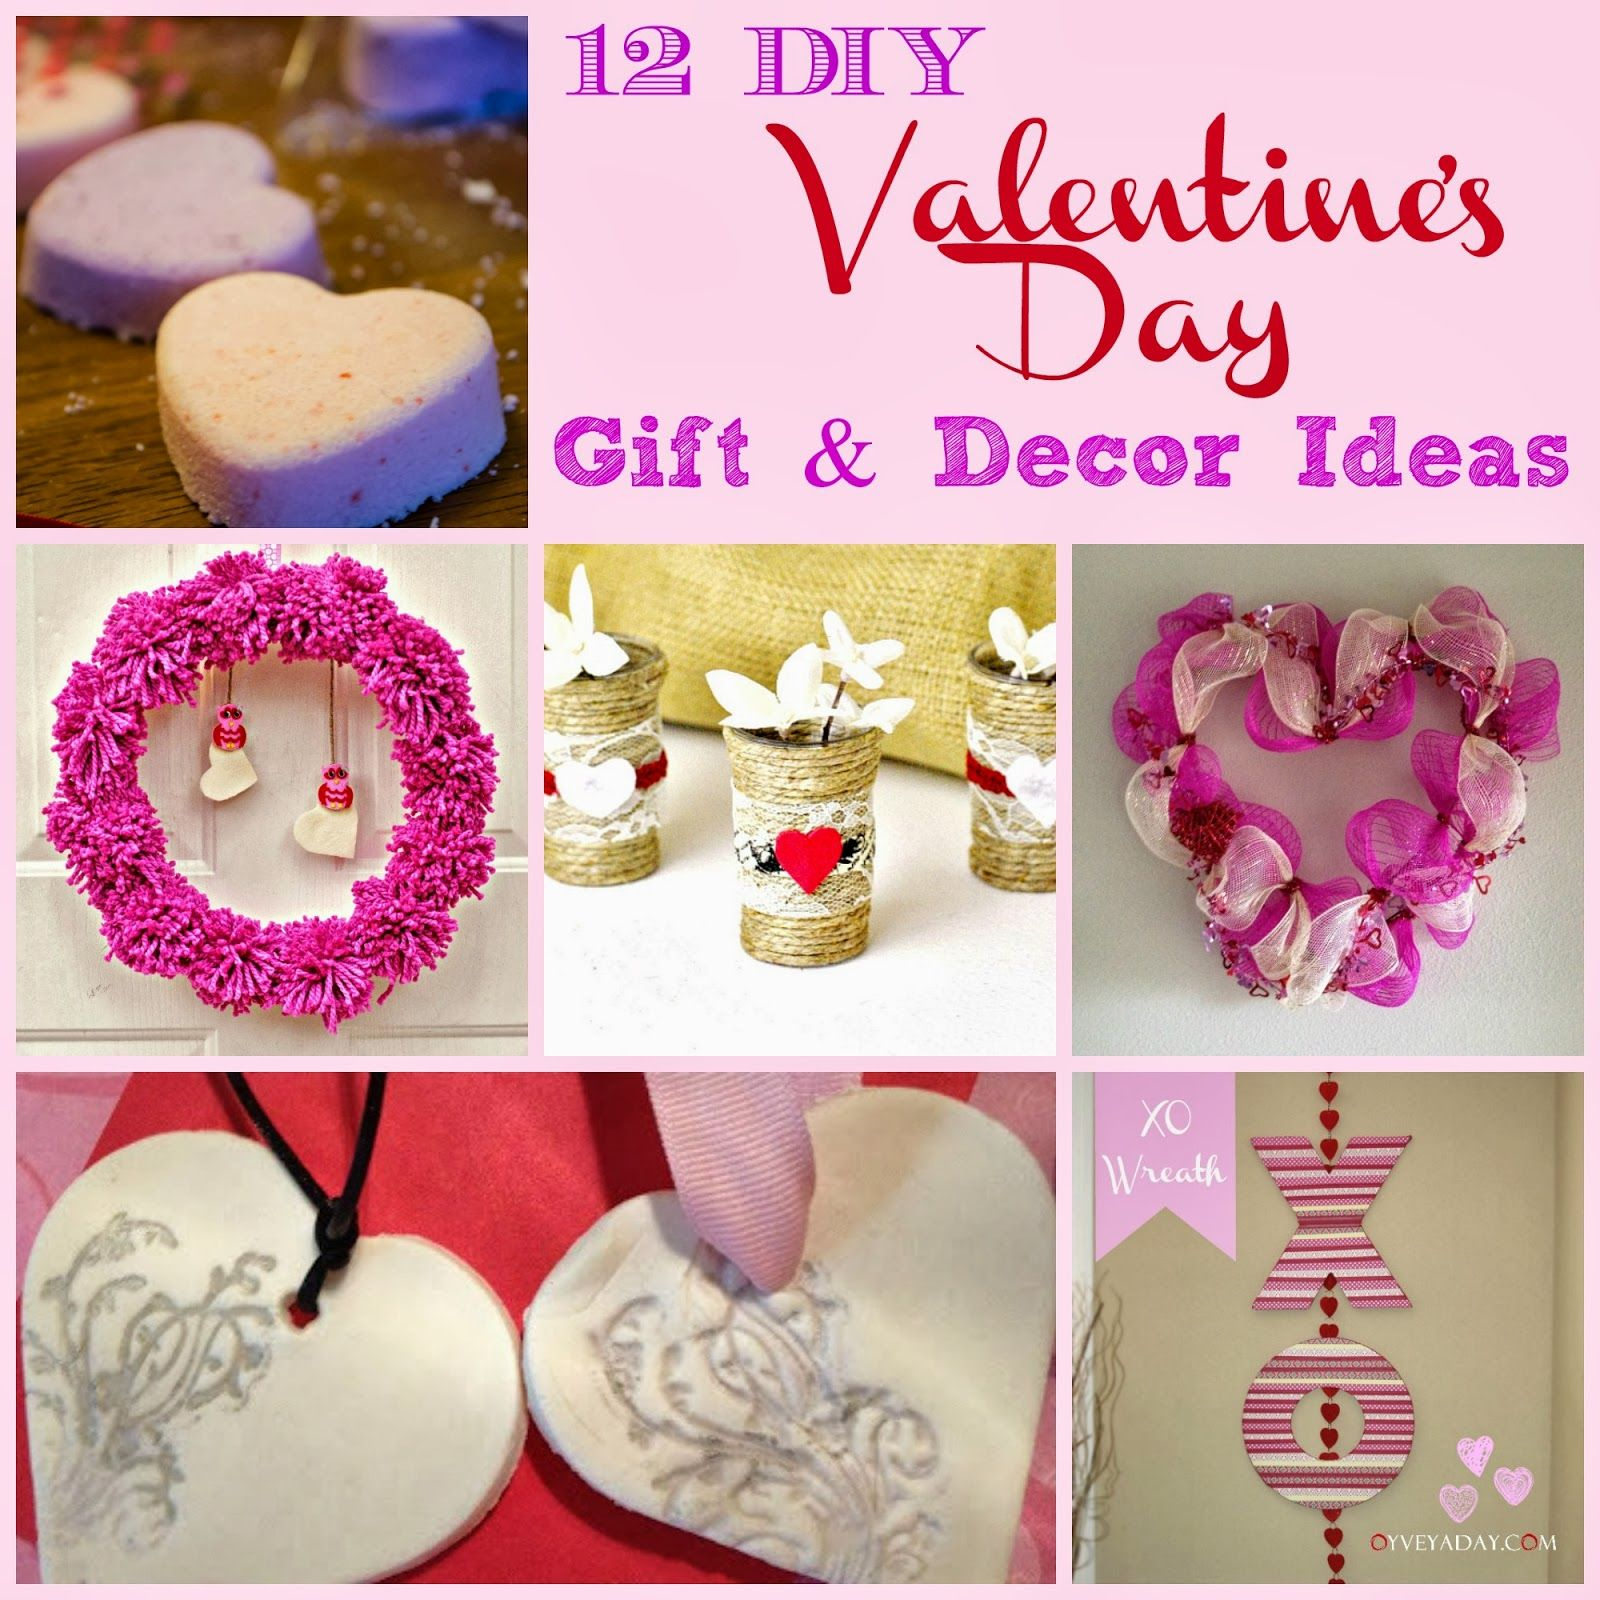 Good Diy Valentine Gifts Part - 5: 12 DIY Valentineu0027s Day Gift U0026 Decor Ideas - Outnumbered 3 To 1